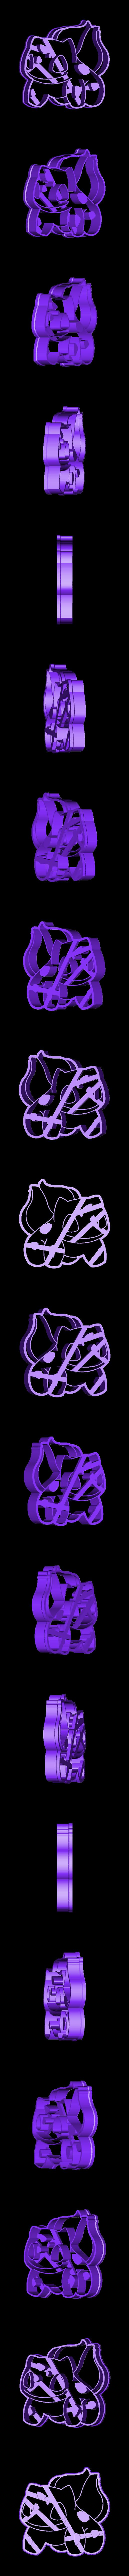 3D-01049 - BULBASAUR COOKIE CUTTER.stl Descargar archivo STL El cortador de galletas Bulbasuar • Diseño imprimible en 3D, 3DPrintersaur